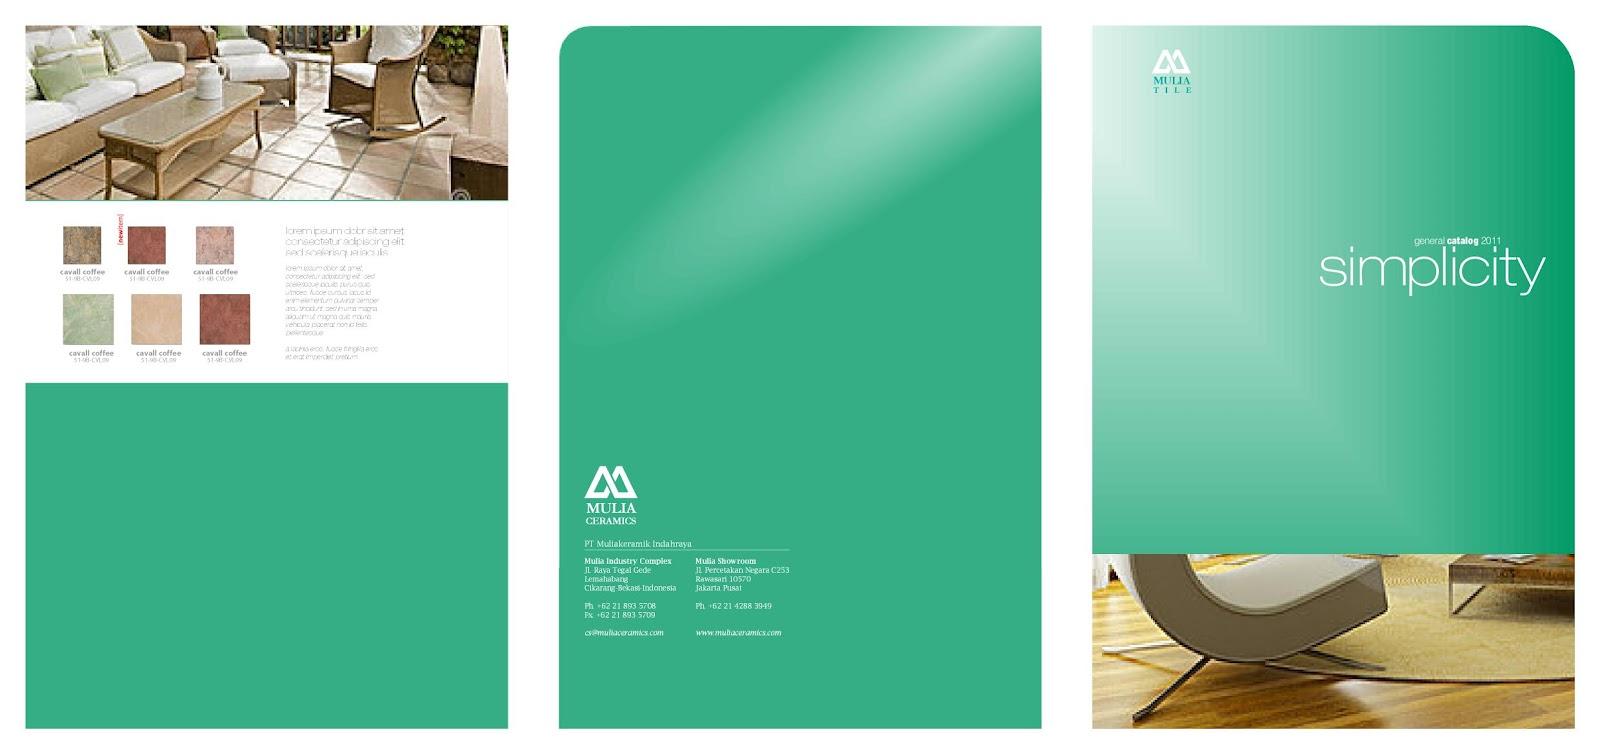 Winasis Artfolio: Katalog dari PT Mulia Ceramics (Tile)